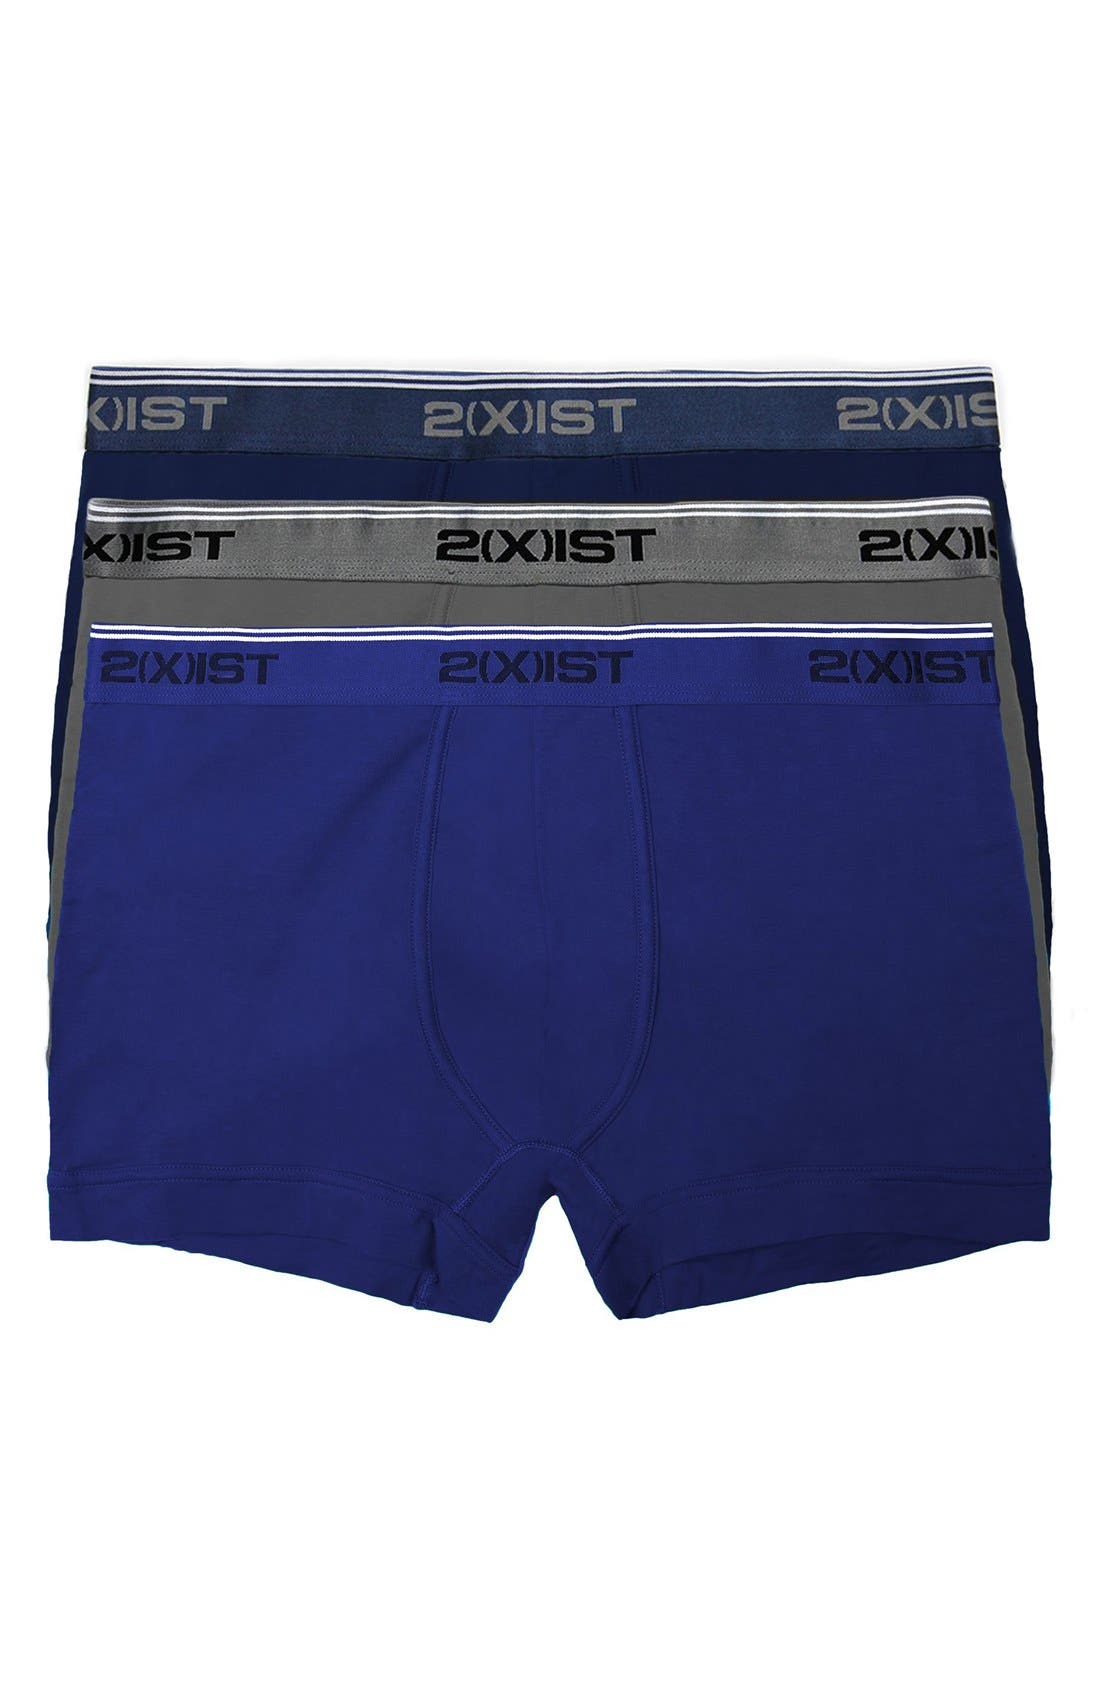 2(X)IST 3-Pack Stretch Boxer Briefs, Main, color, ECLIPSE/ LEAD/ CARIBBEAN